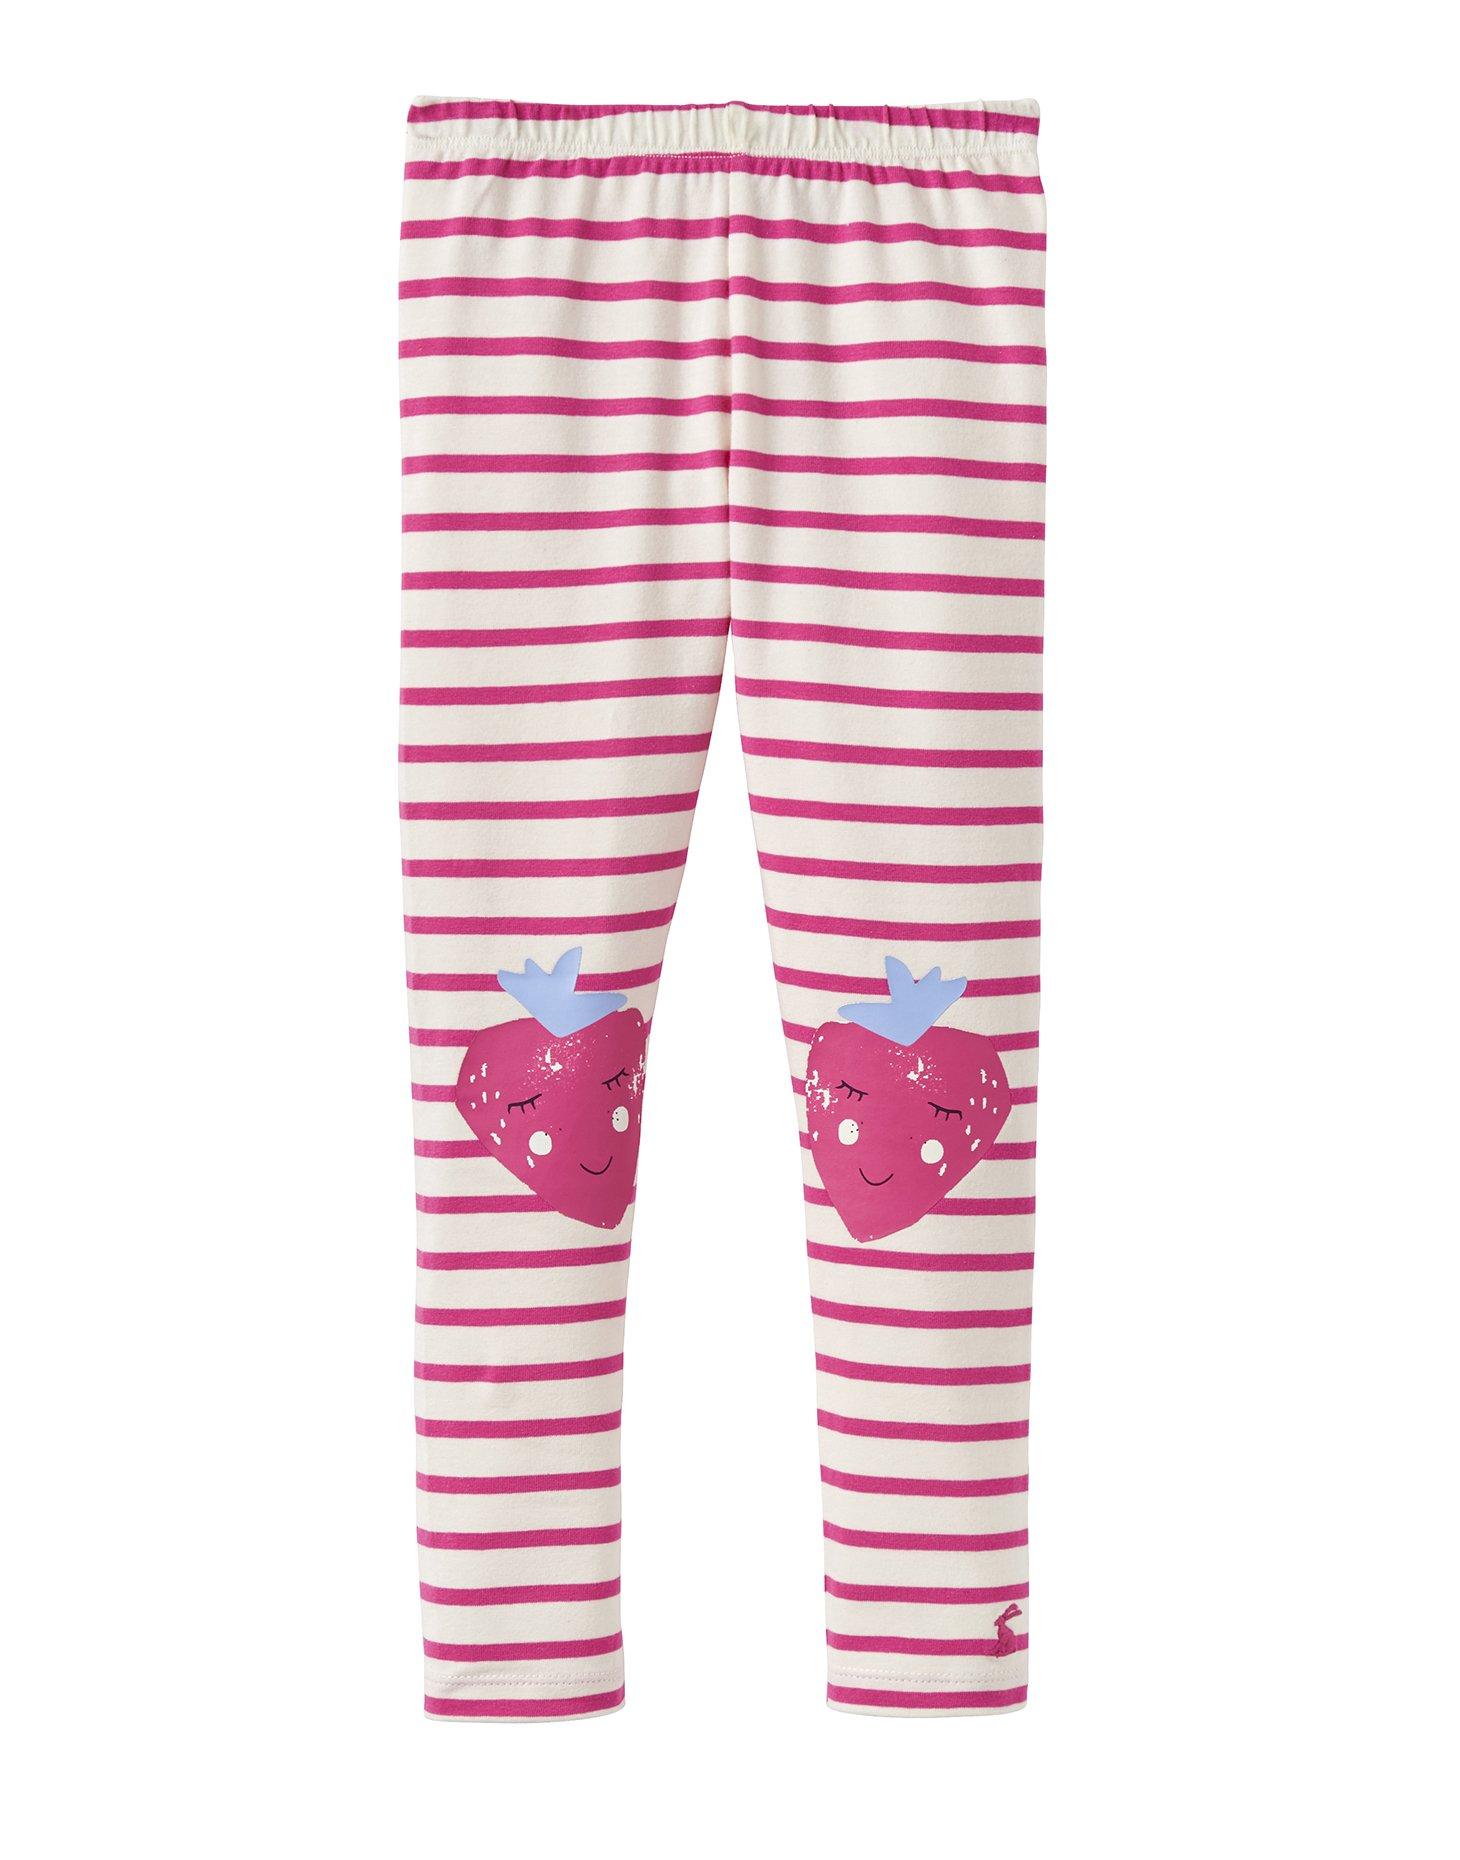 Joules Character Leggings - Bright Pink Stripe - 1 Year - 80 cm